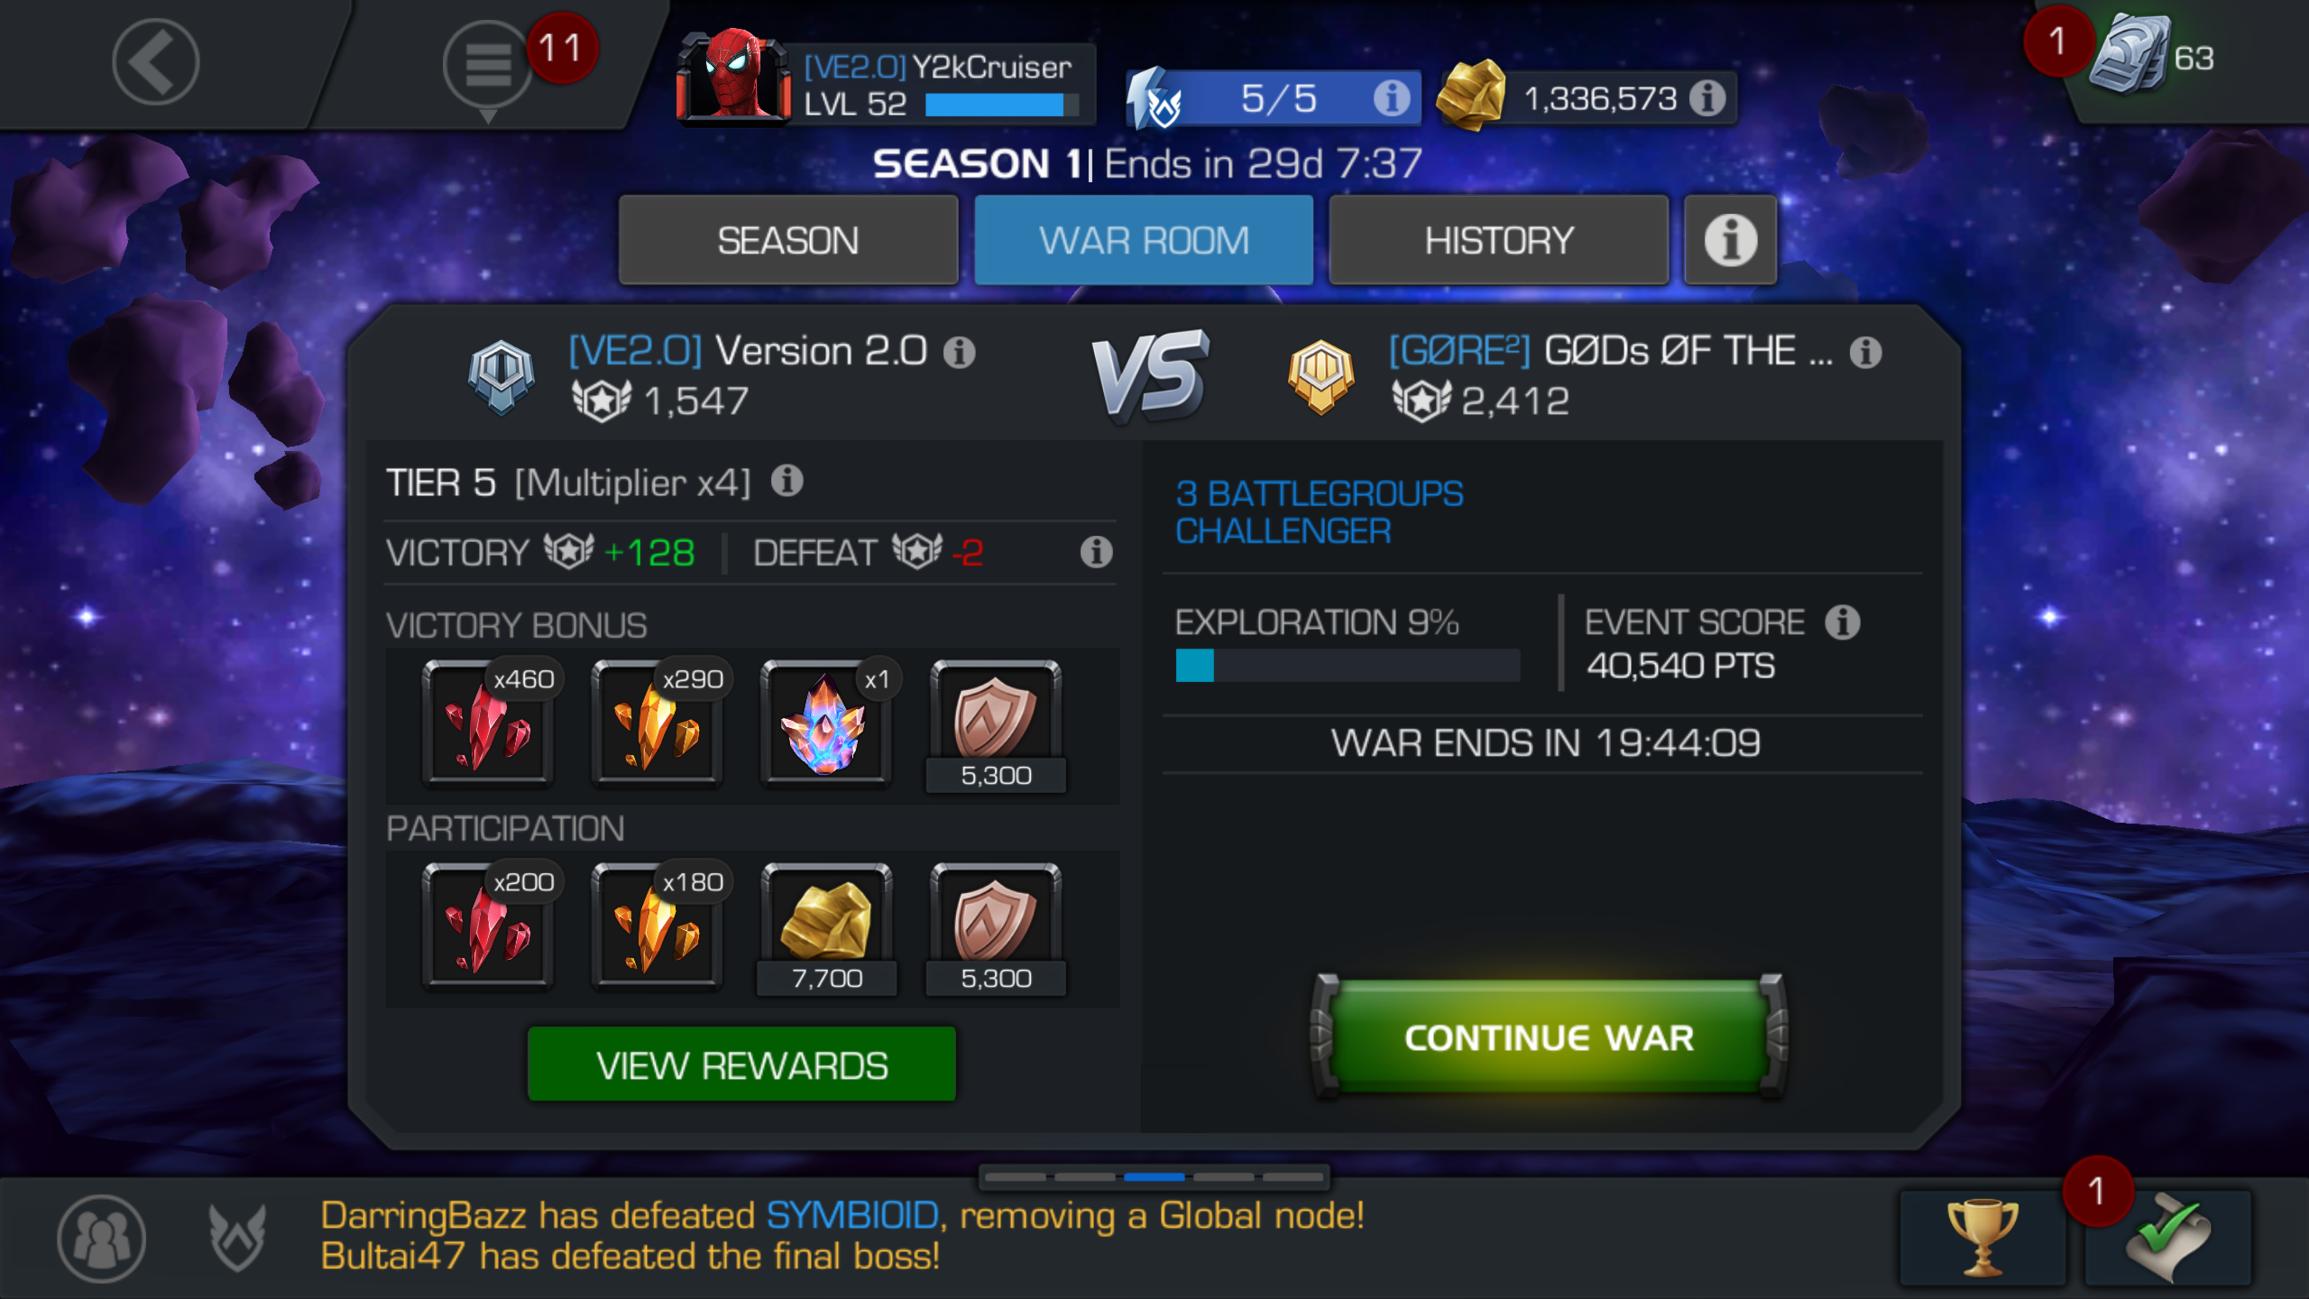 Matchmaking 9,0